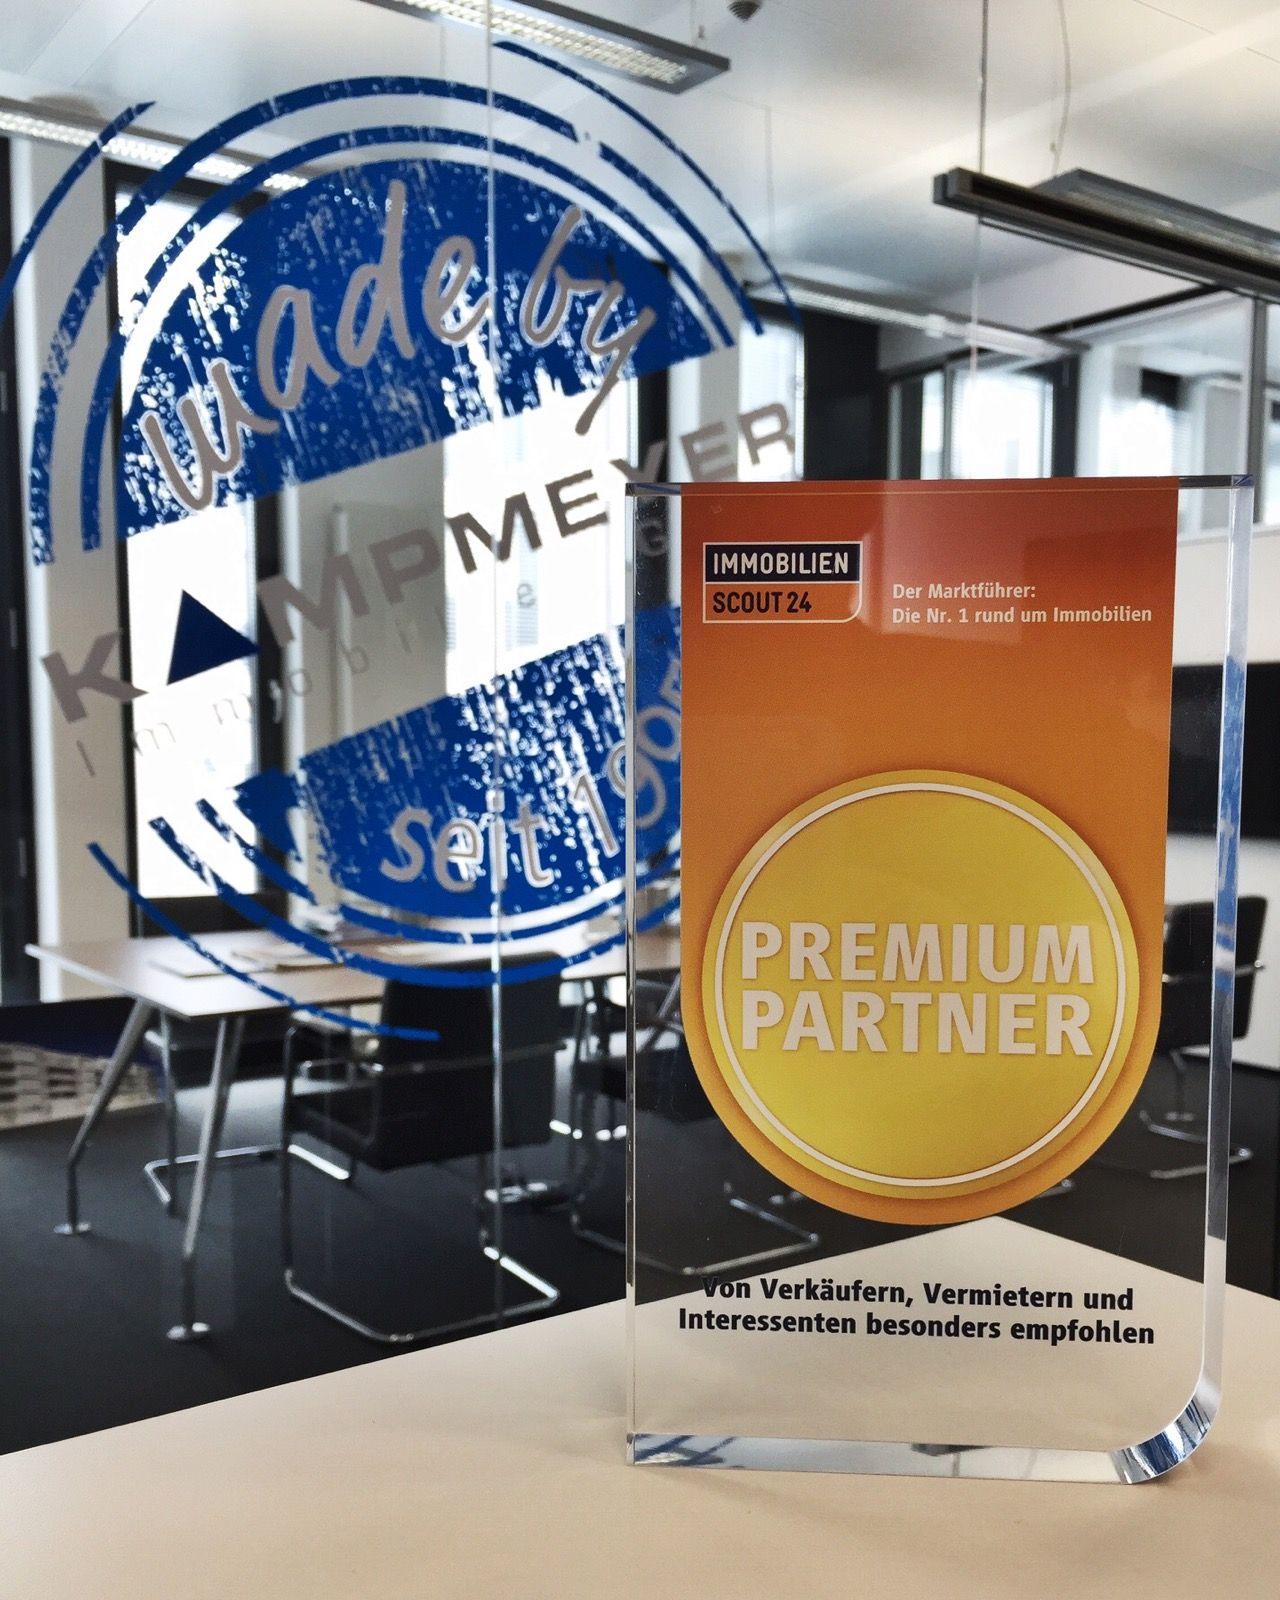 Haus Mieten In Moers Immobilienscout24: KAMPMEYER Ist ImmobilienScout24 Premium-Partner 2013